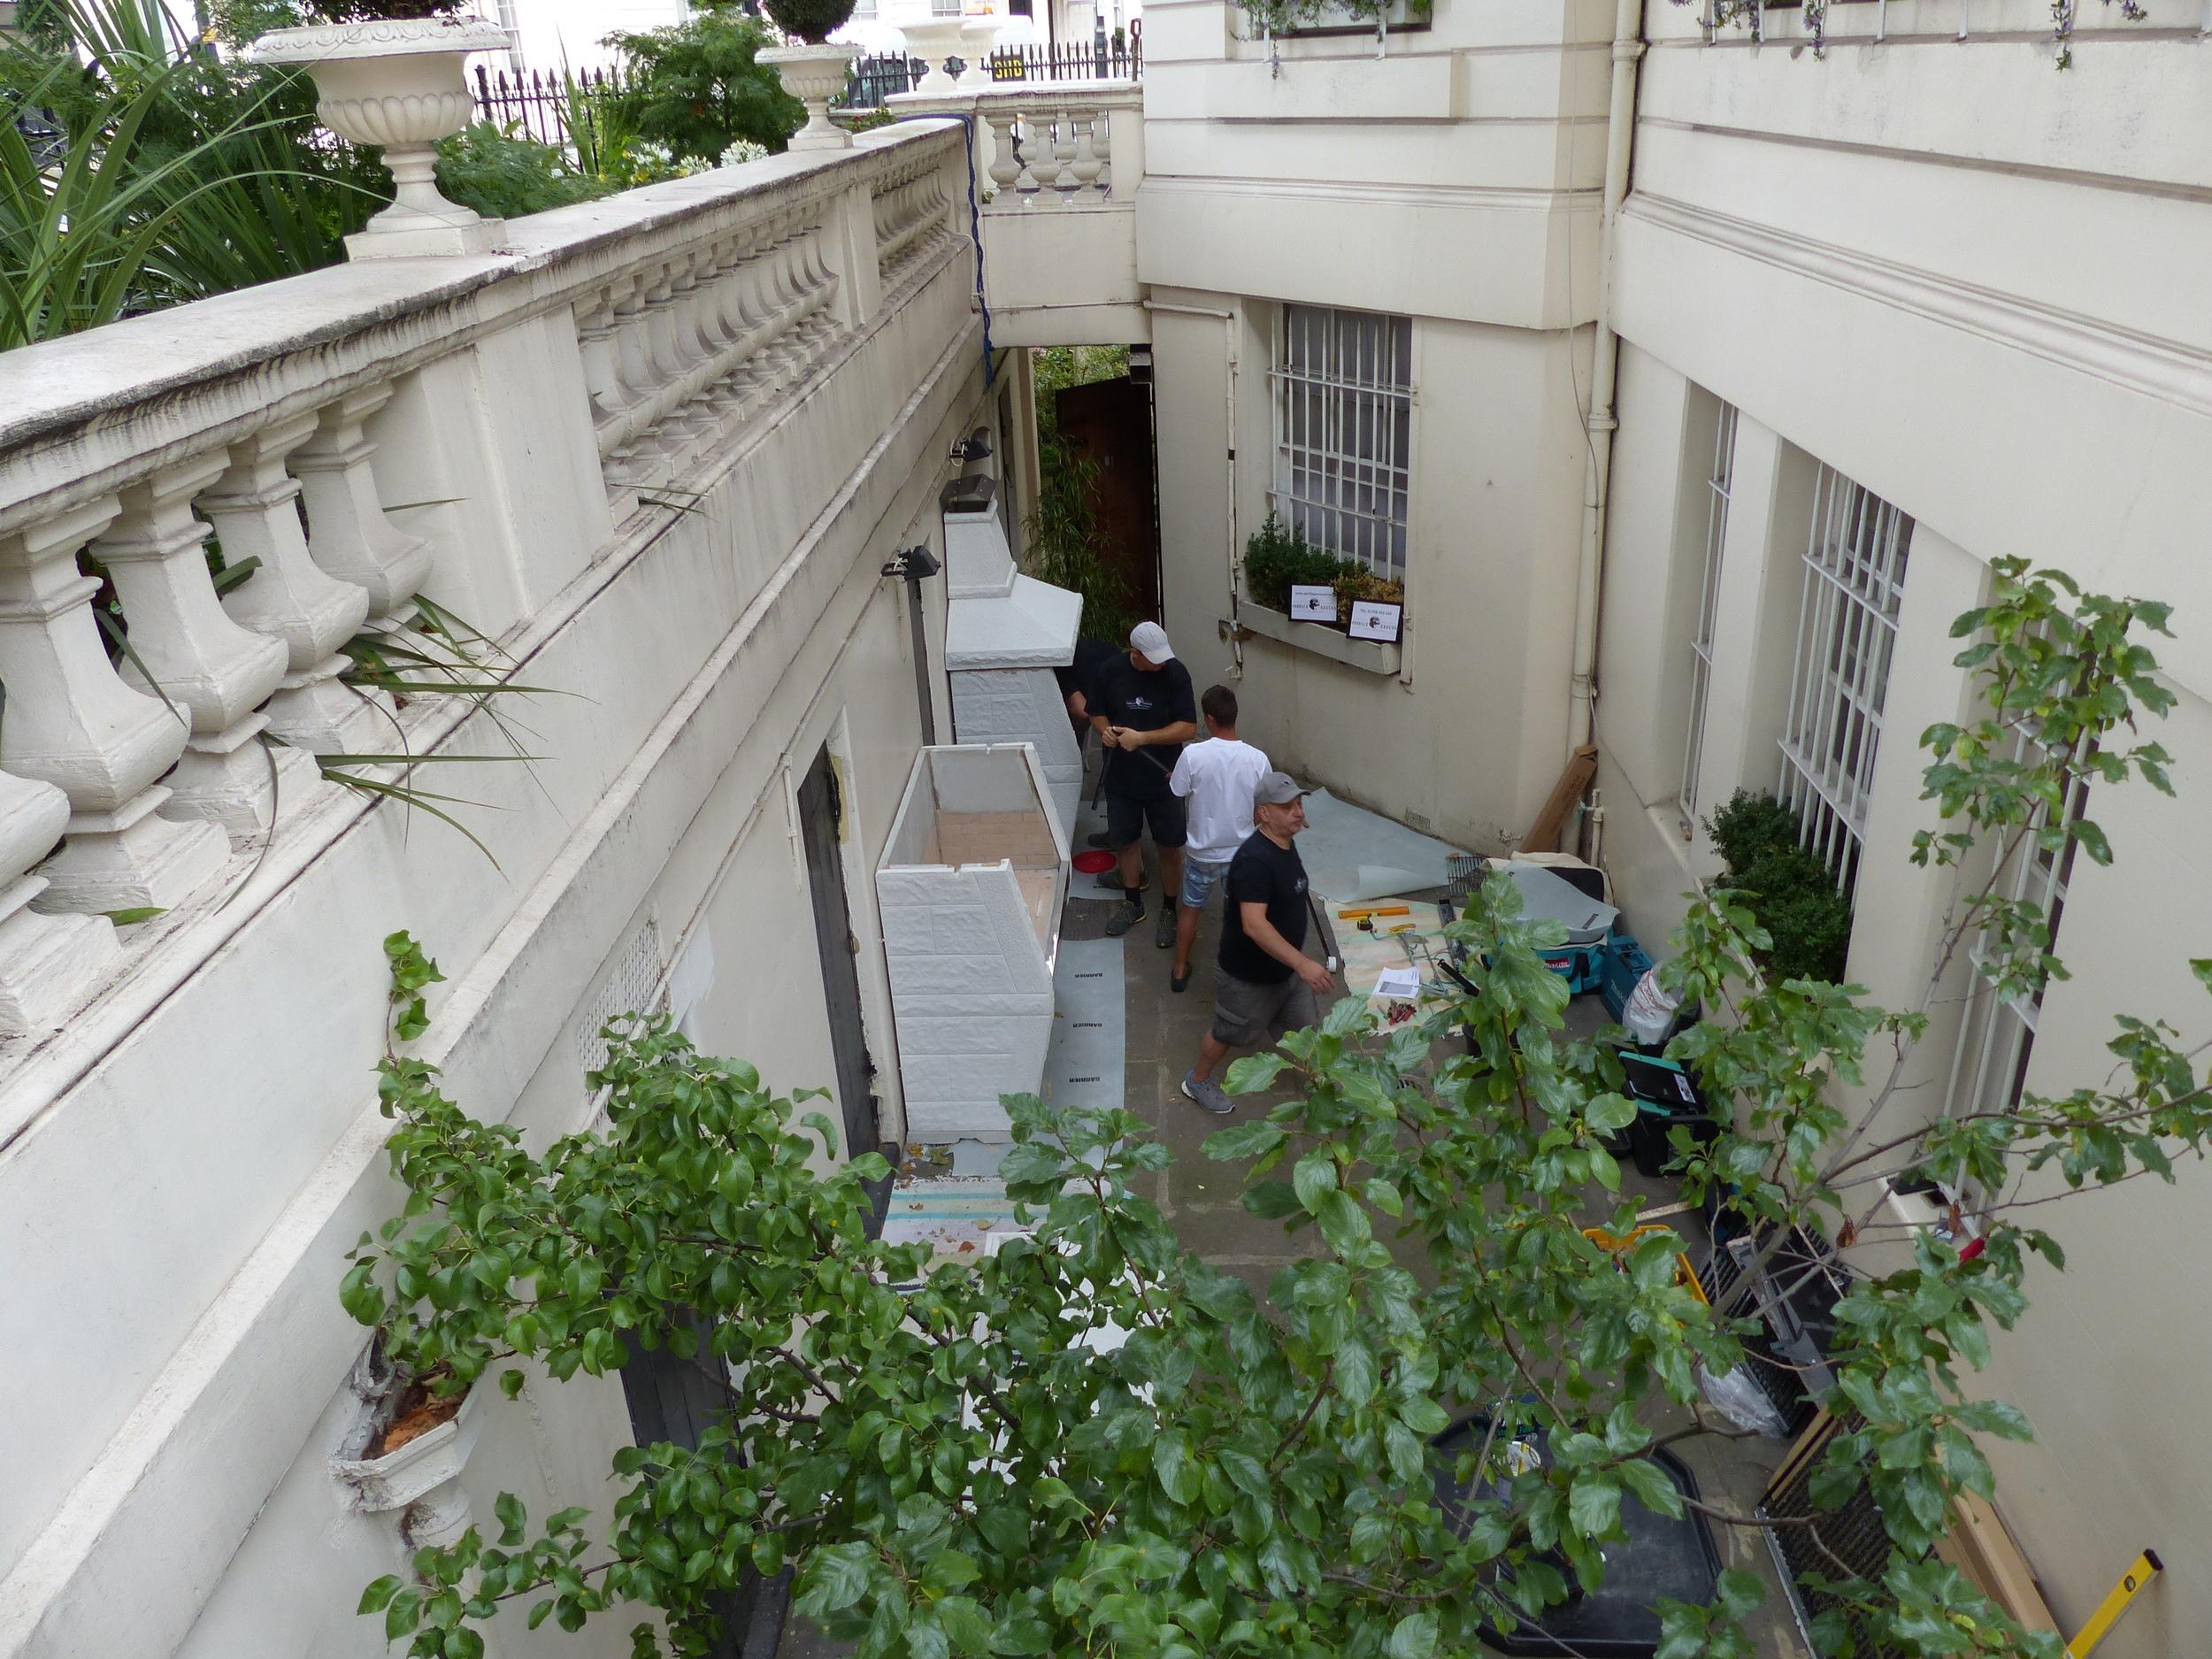 2016_07_24 Ambasciata Argentina - Fotocamera 072.JPG